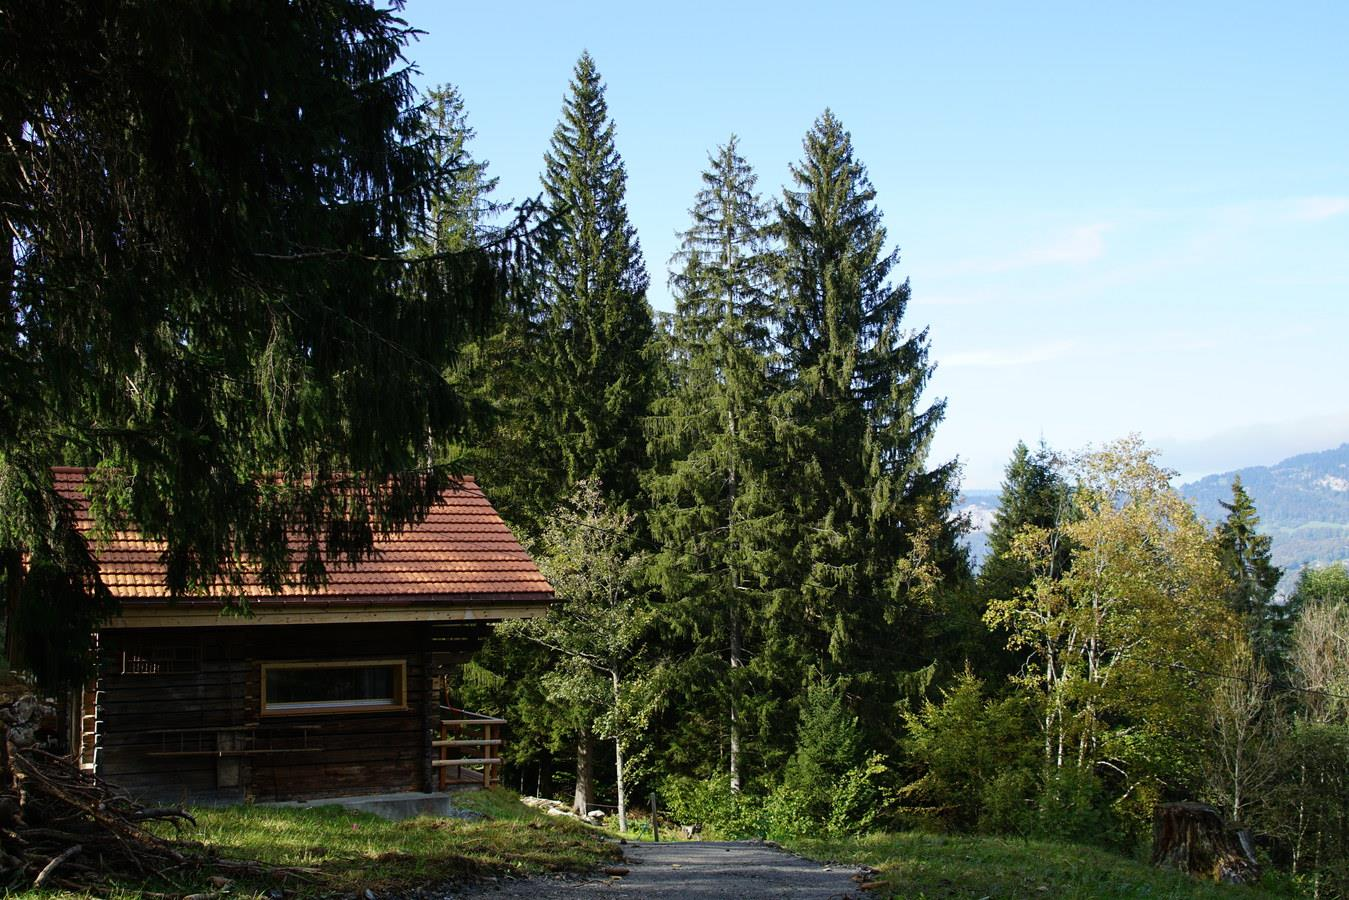 Holiday house Wollhaus Oberzwirgi 6-Bettwohnung (2692249), Schattenhalb, Meiringen - Hasliberg, Bernese Oberland, Switzerland, picture 3